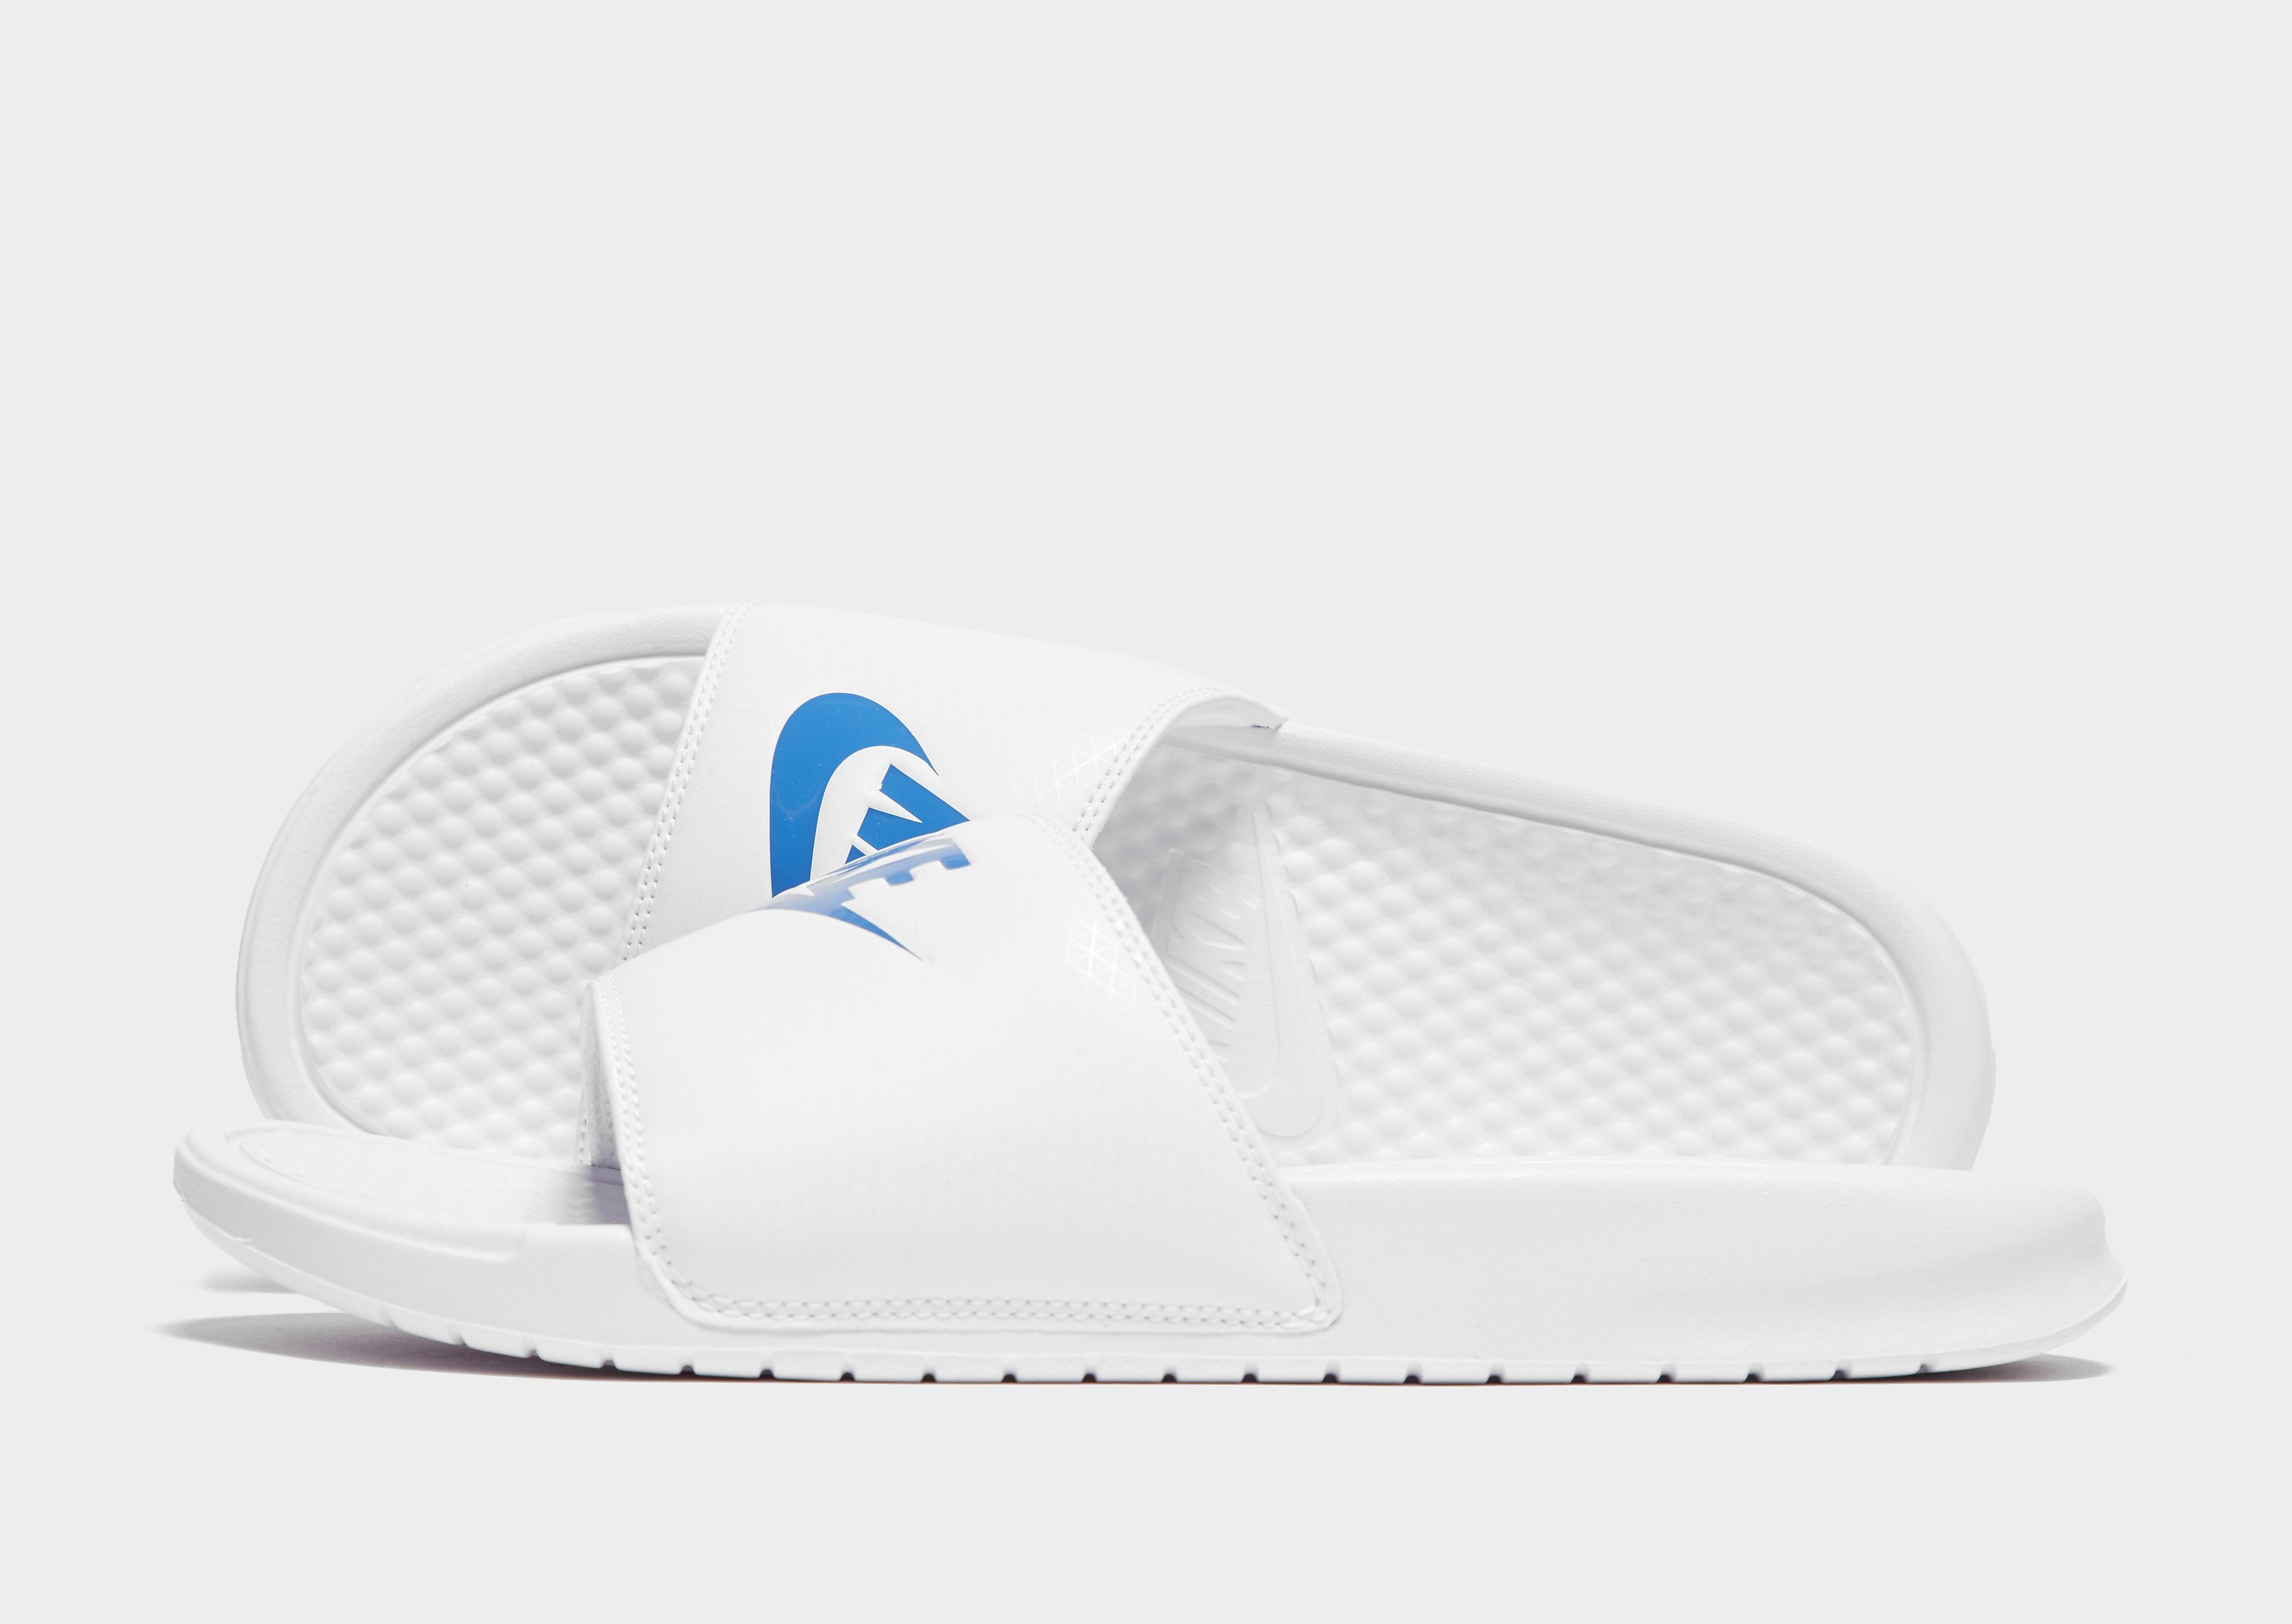 Nike chanclas Benassi Just Do It